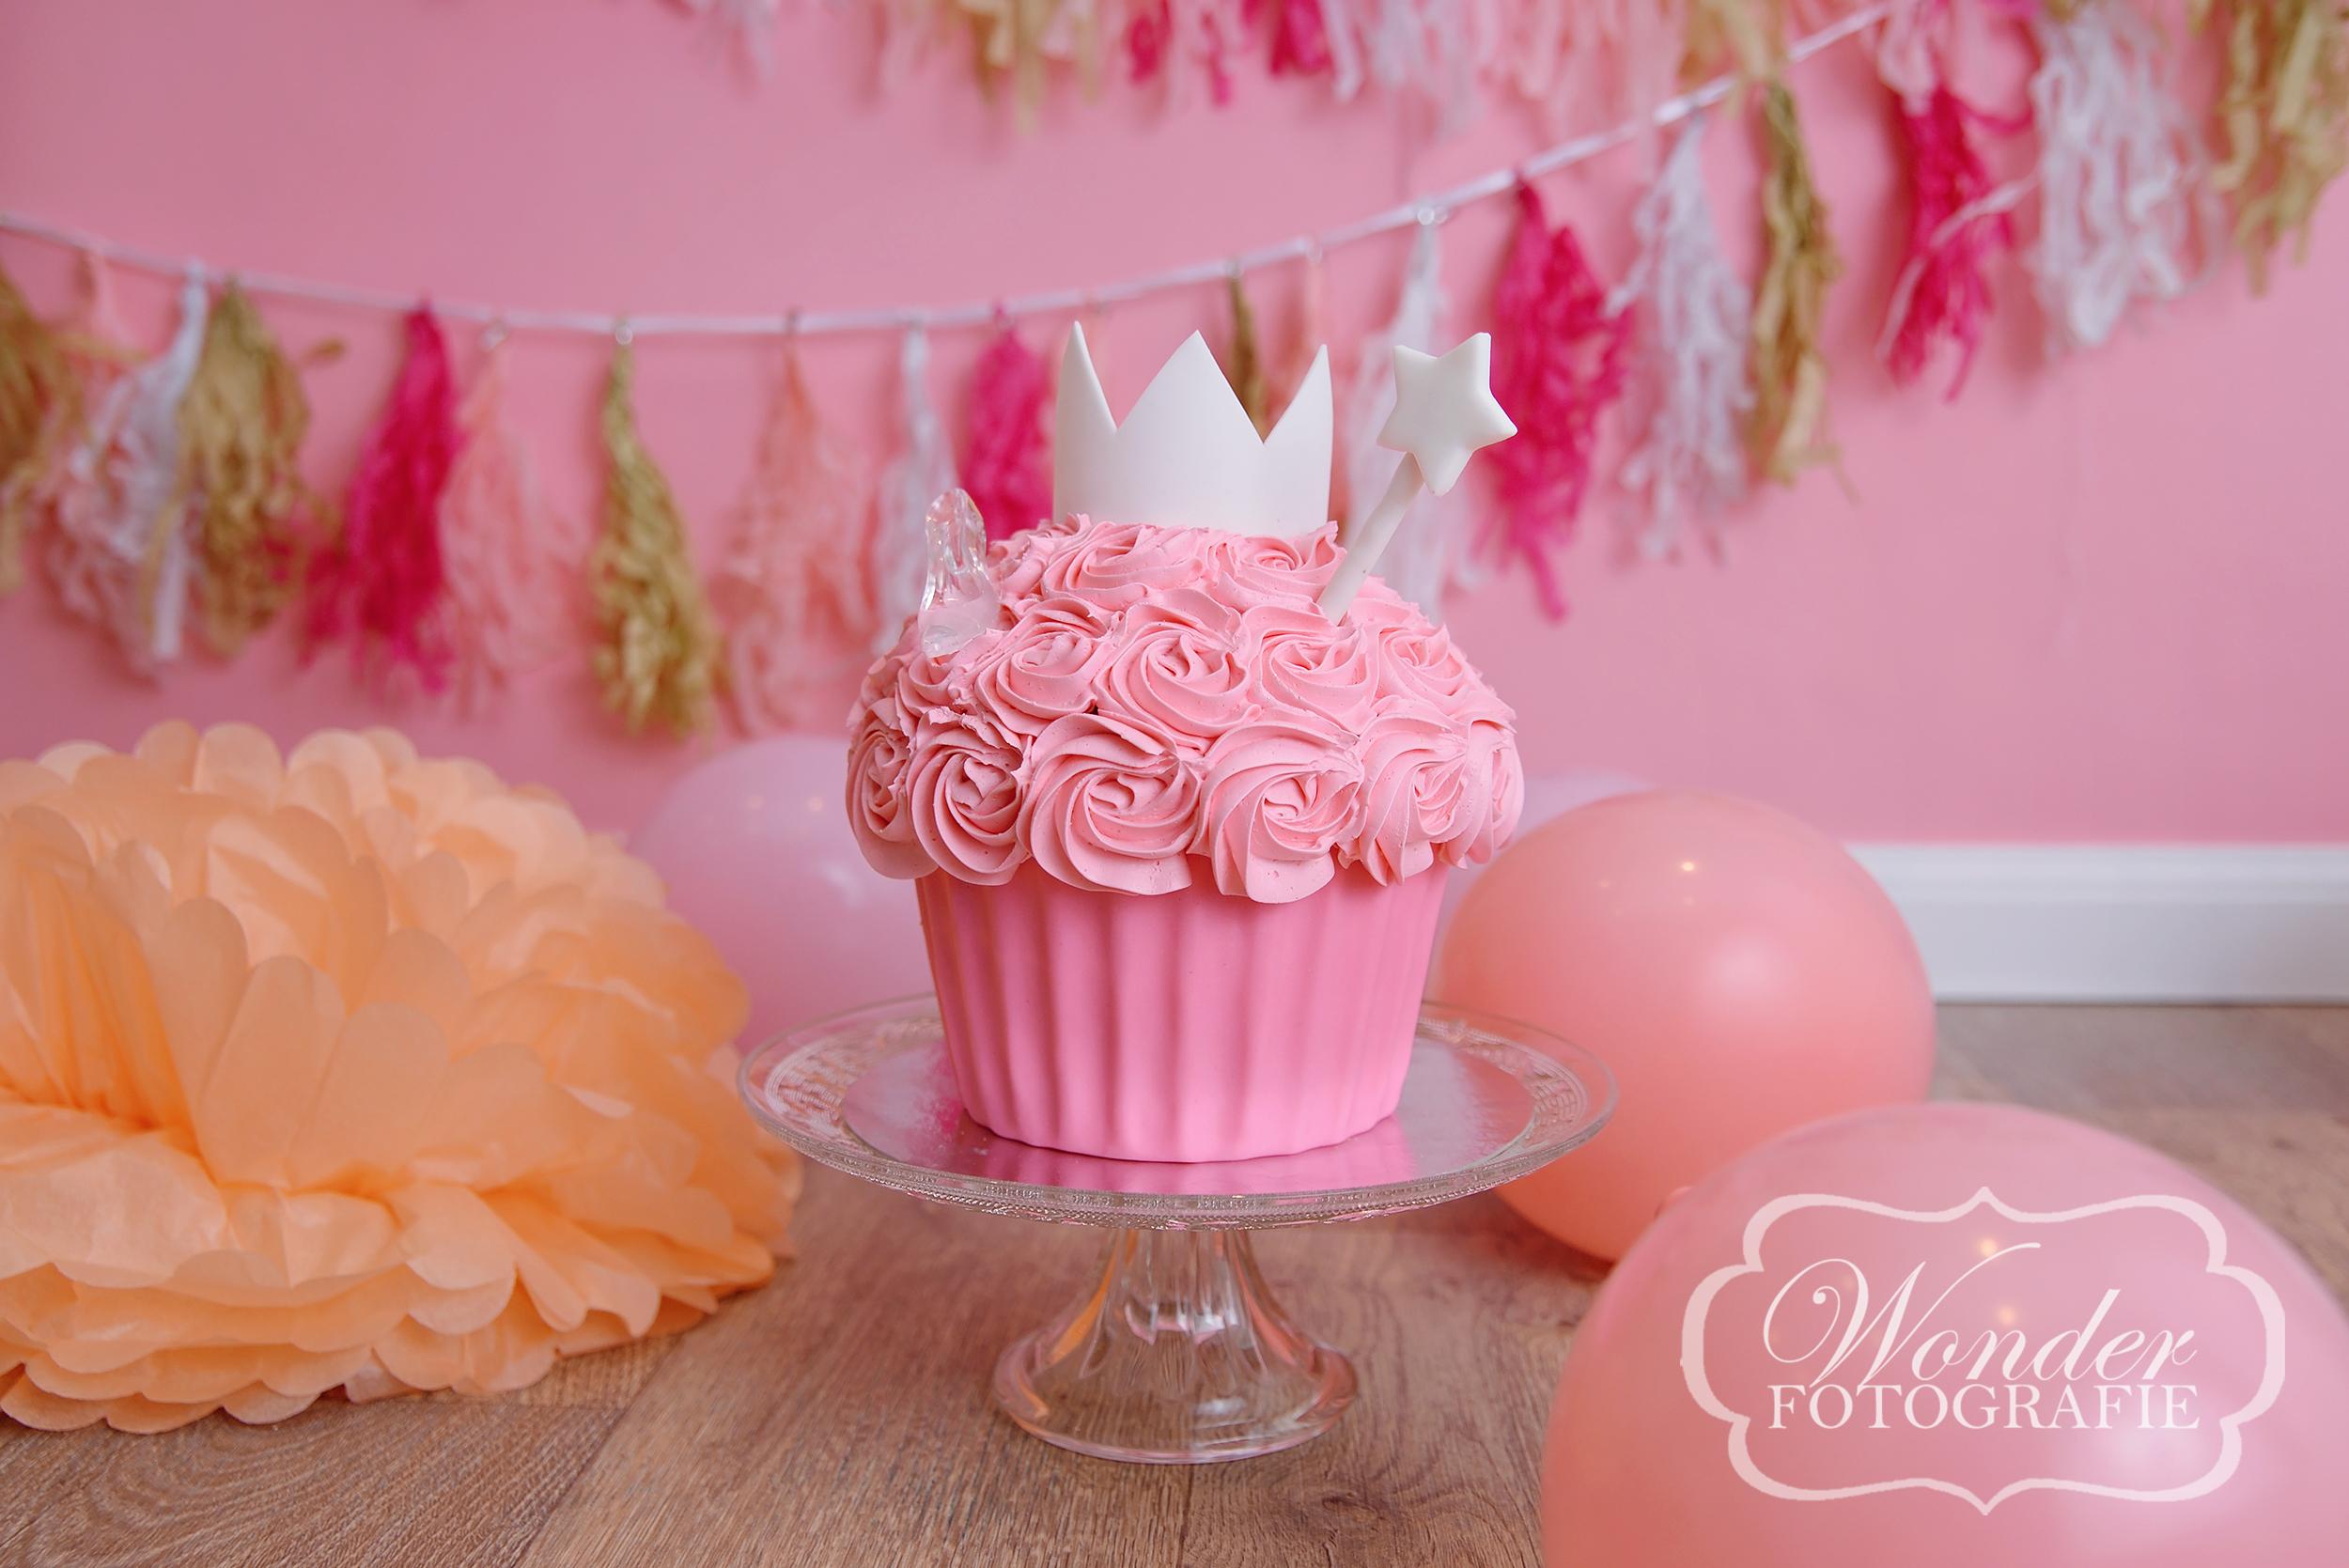 Cake Smash Roze Prinsessen - Wonder Fotografie